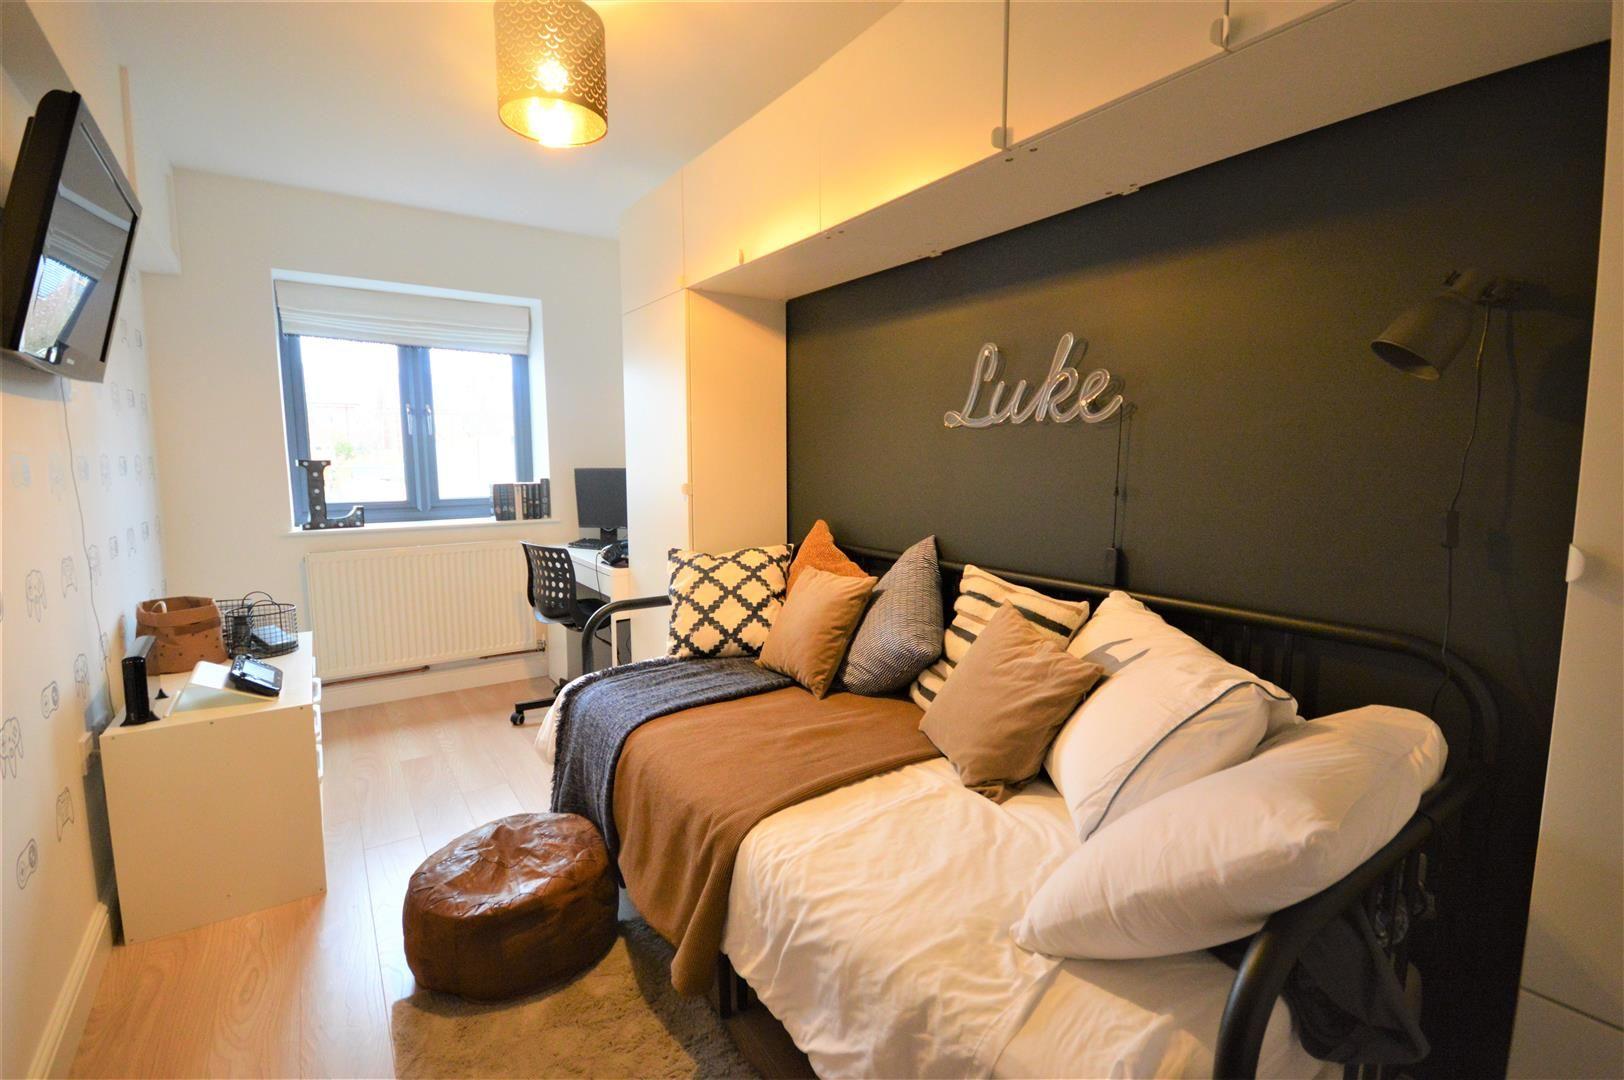 5 bed detached for sale in Leominster  - Property Image 7